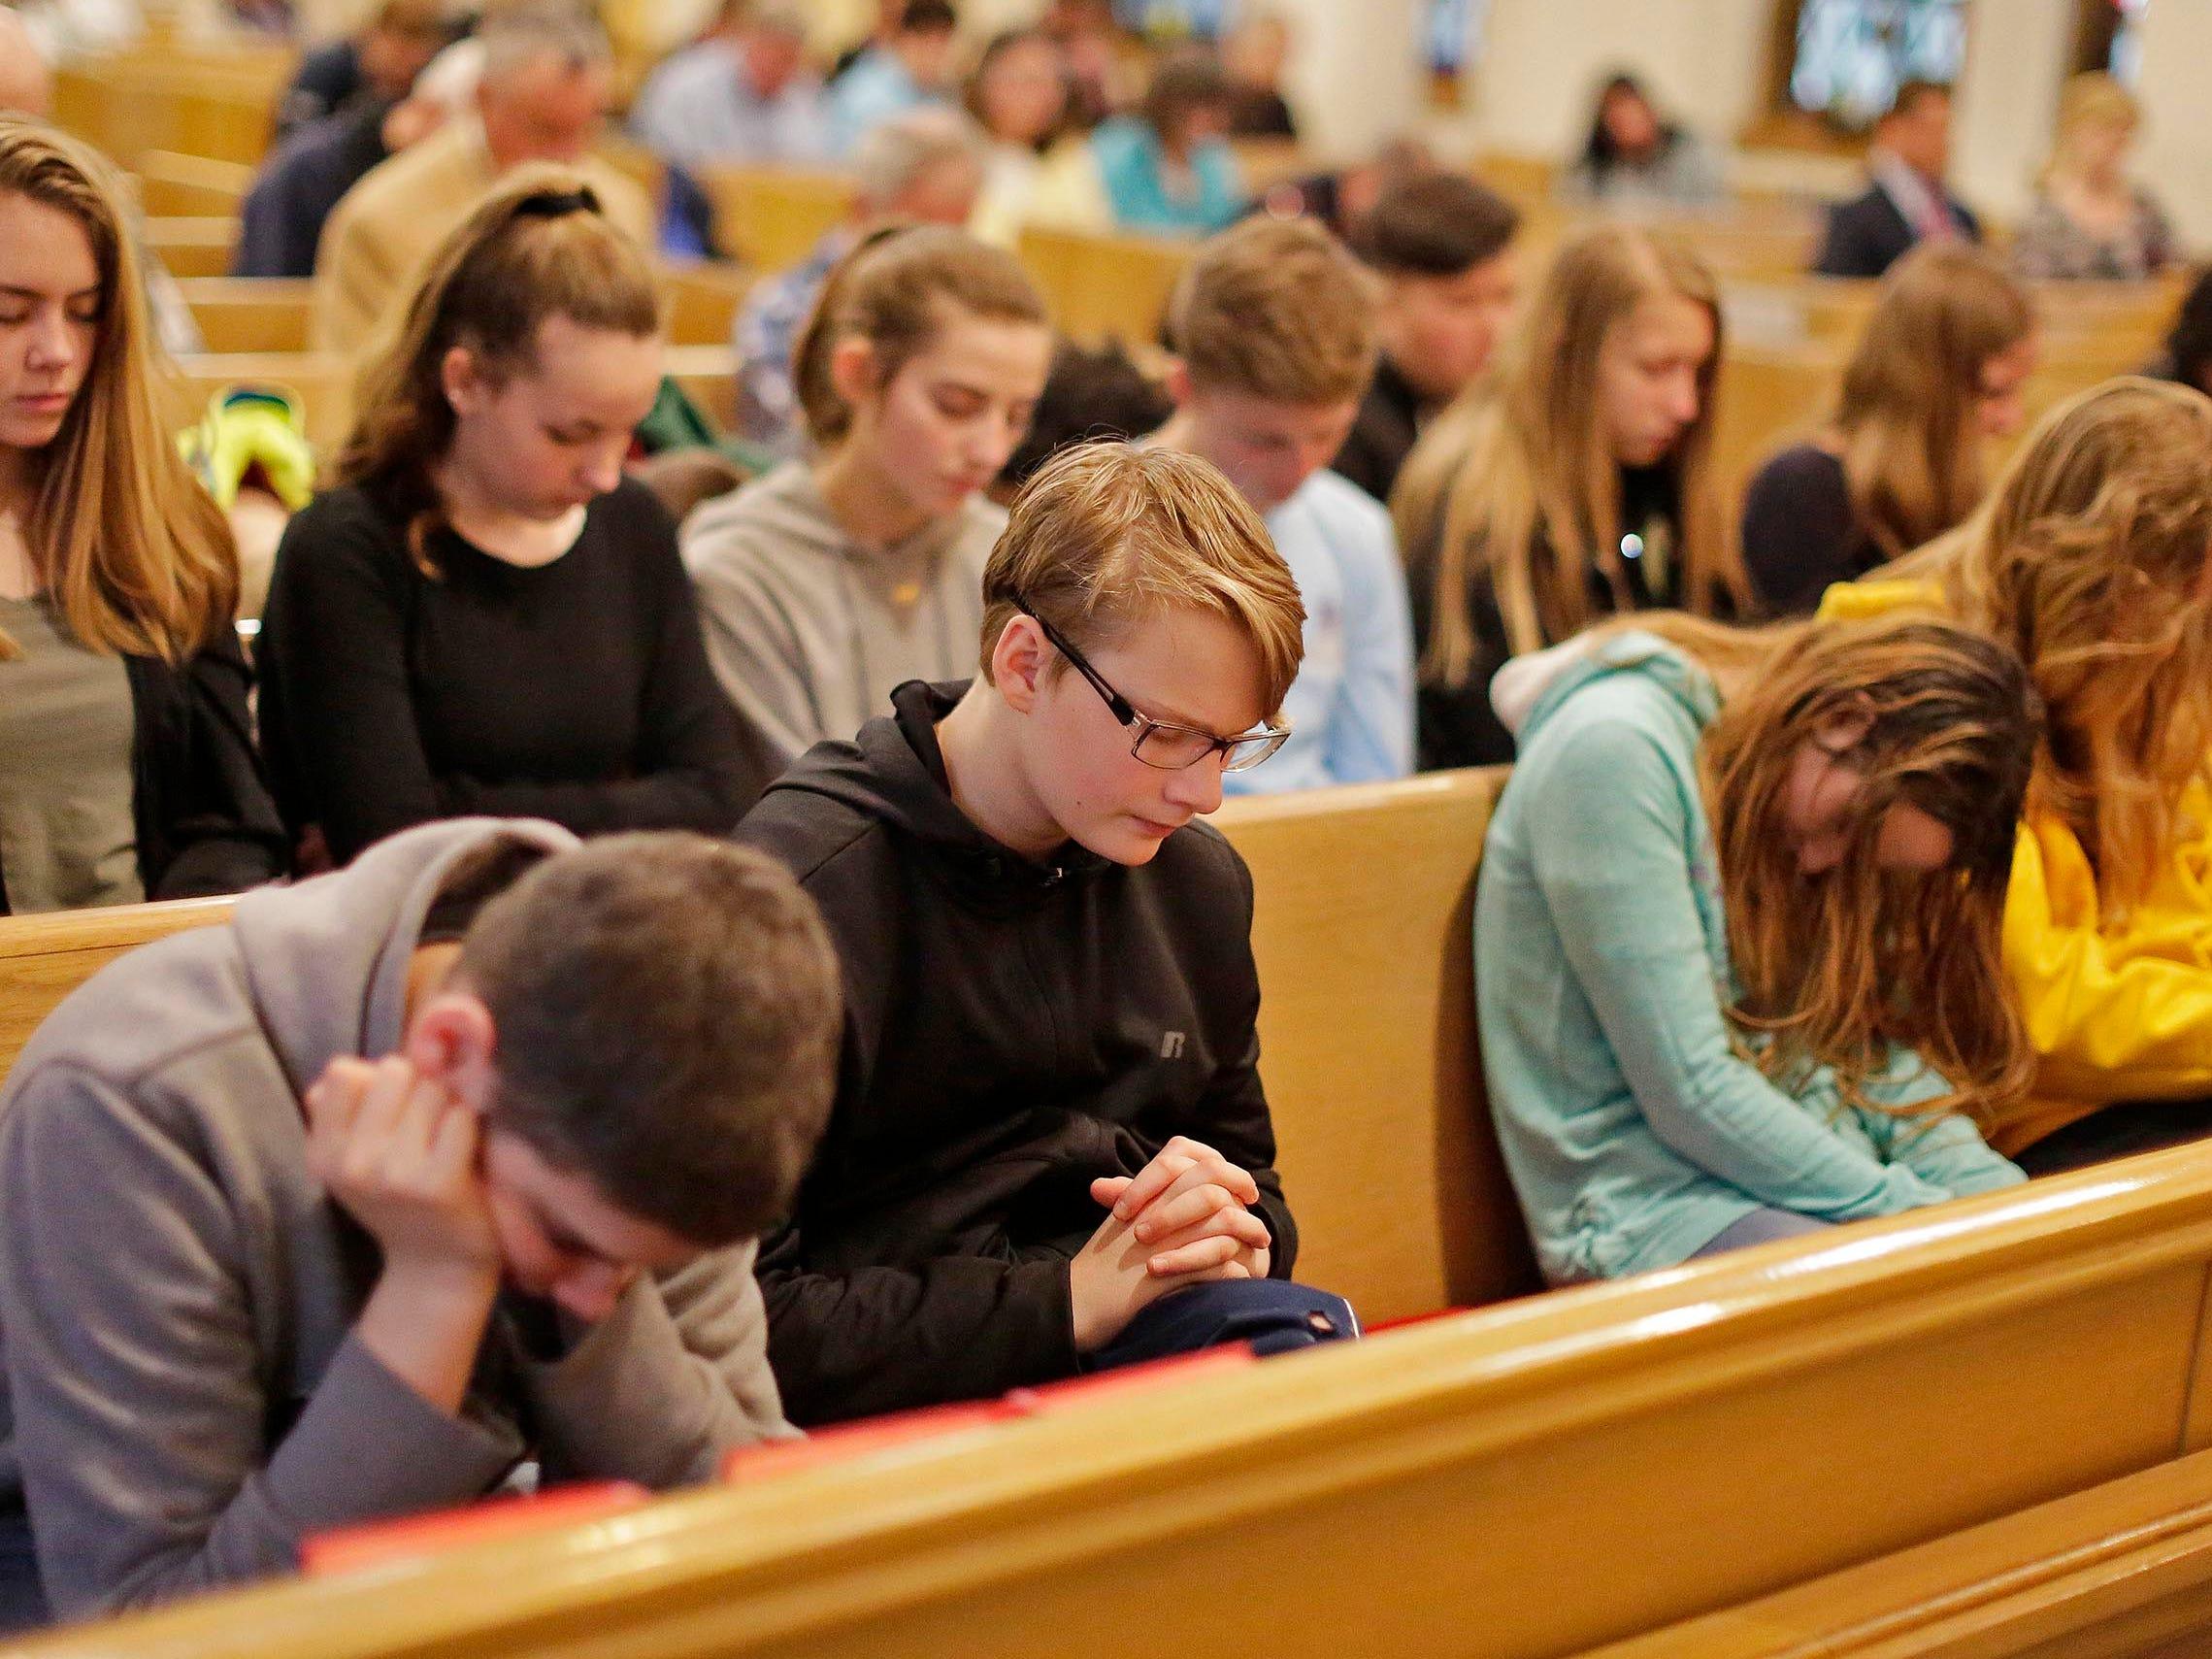 Students from Sheboygan Christian School pray during the National Day of Prayer, Thursday, May 2, 2019, at Fountain Park Church, in Sheboygan, Wis.